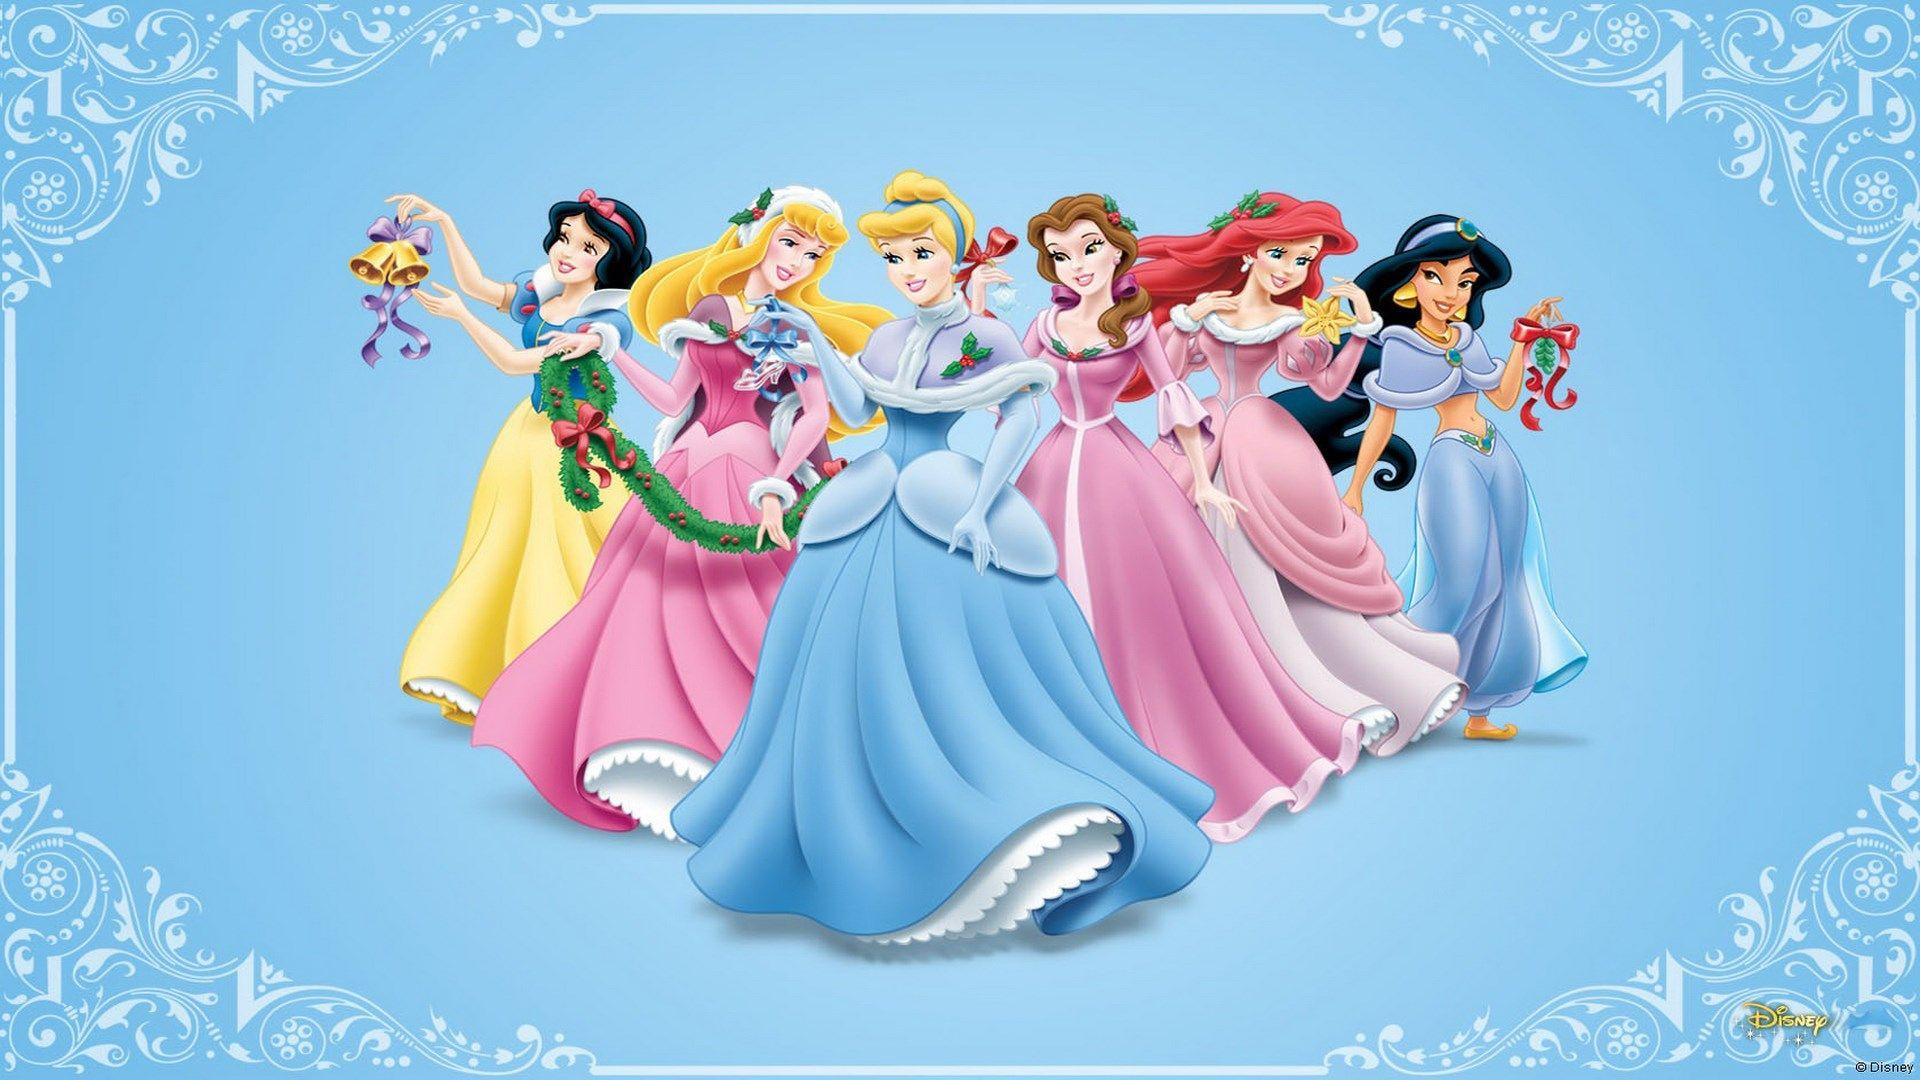 Hd Princess Wallpaper Download Free Disney BelleDisney